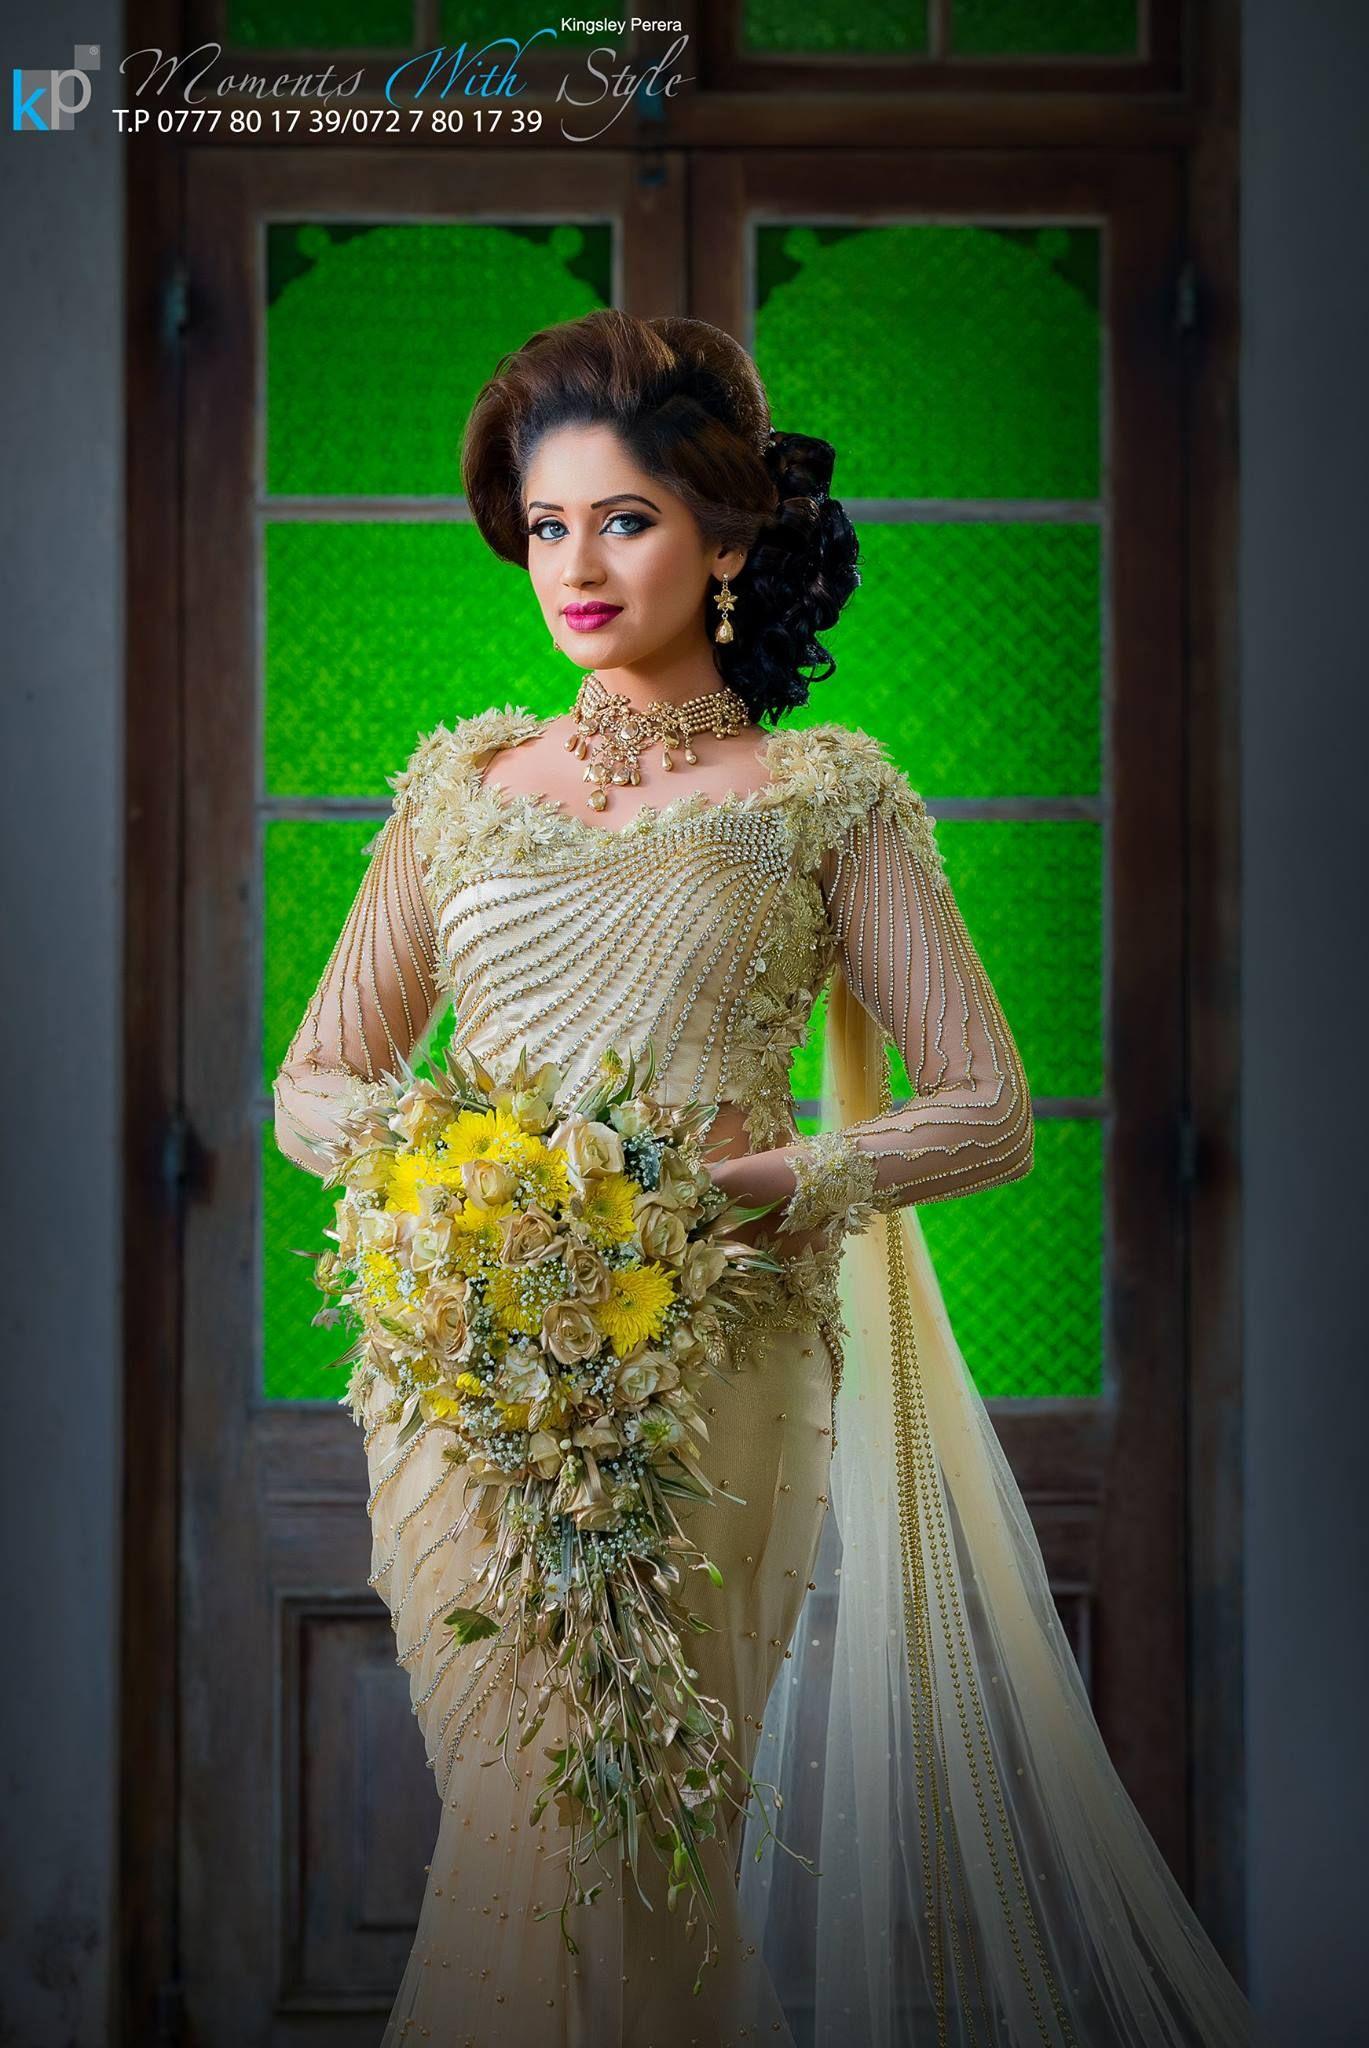 Sri Lankan Wedding Dressed By Salon Geethanjalee Indian Wedding Dress Modern Indian Wedding Dress Wedding Dress Styles